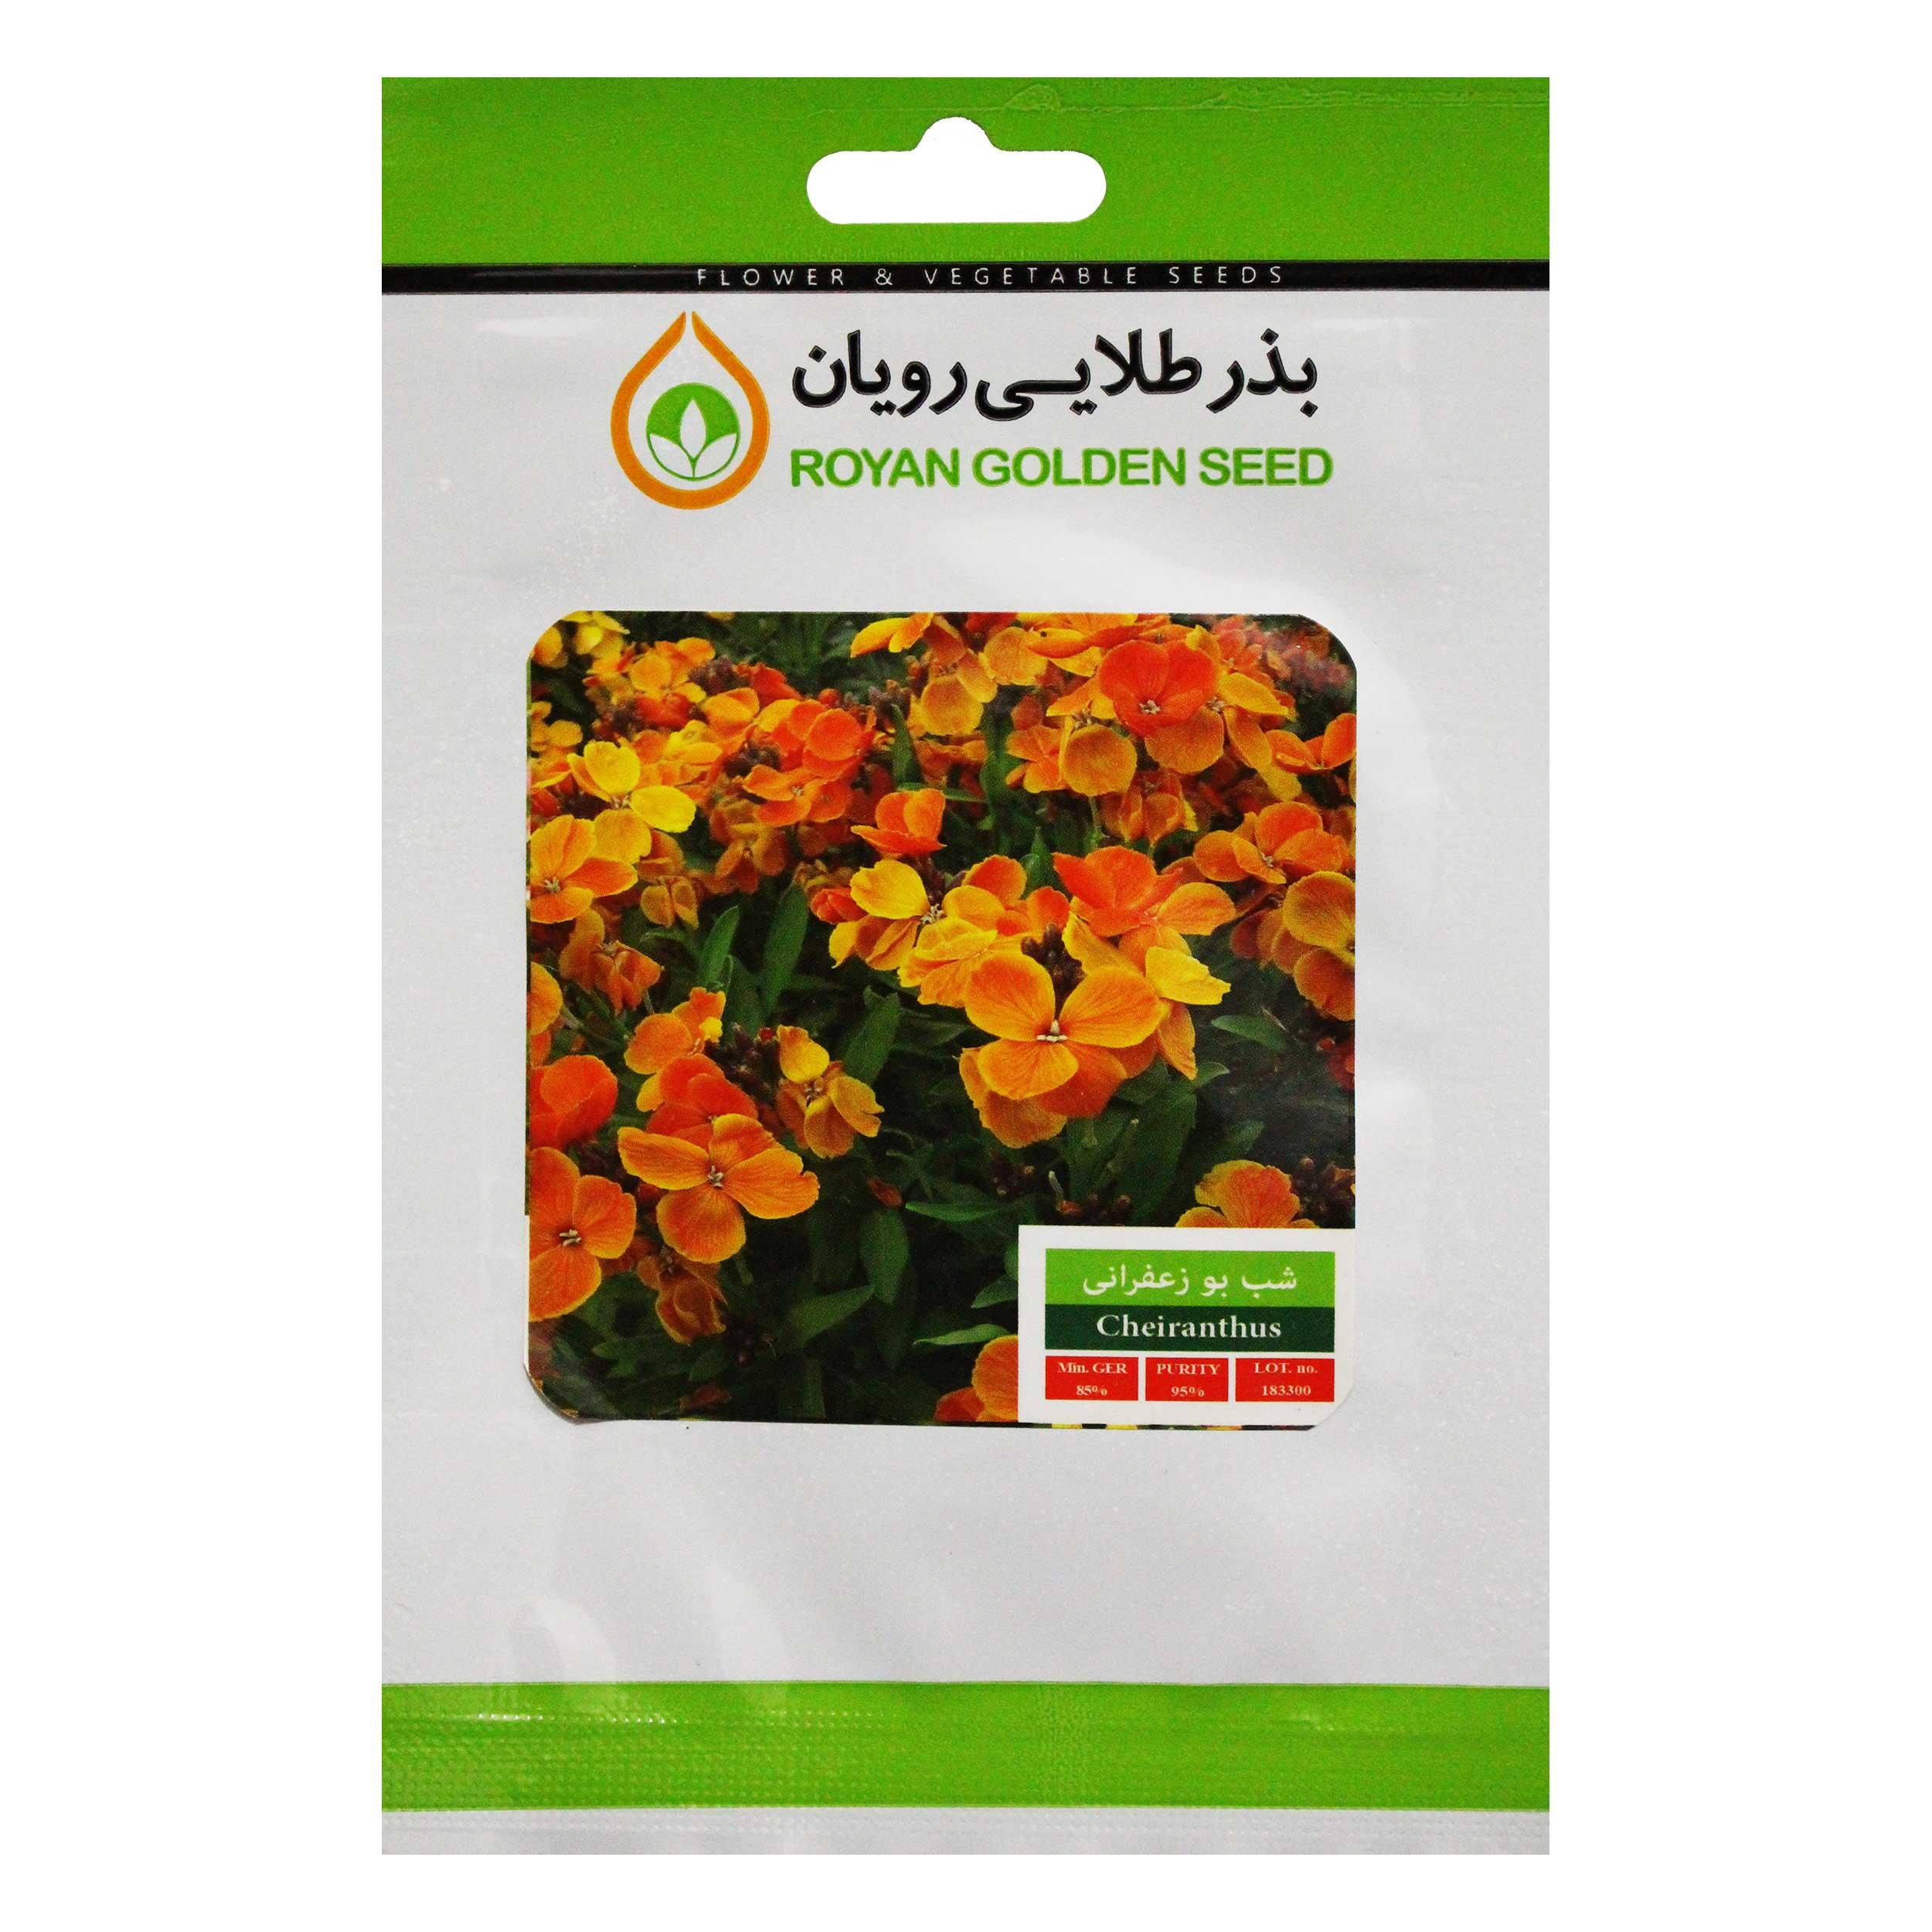 بذر گل شب بو زعفرانی بذر طلایی رویان کد BZTR-022